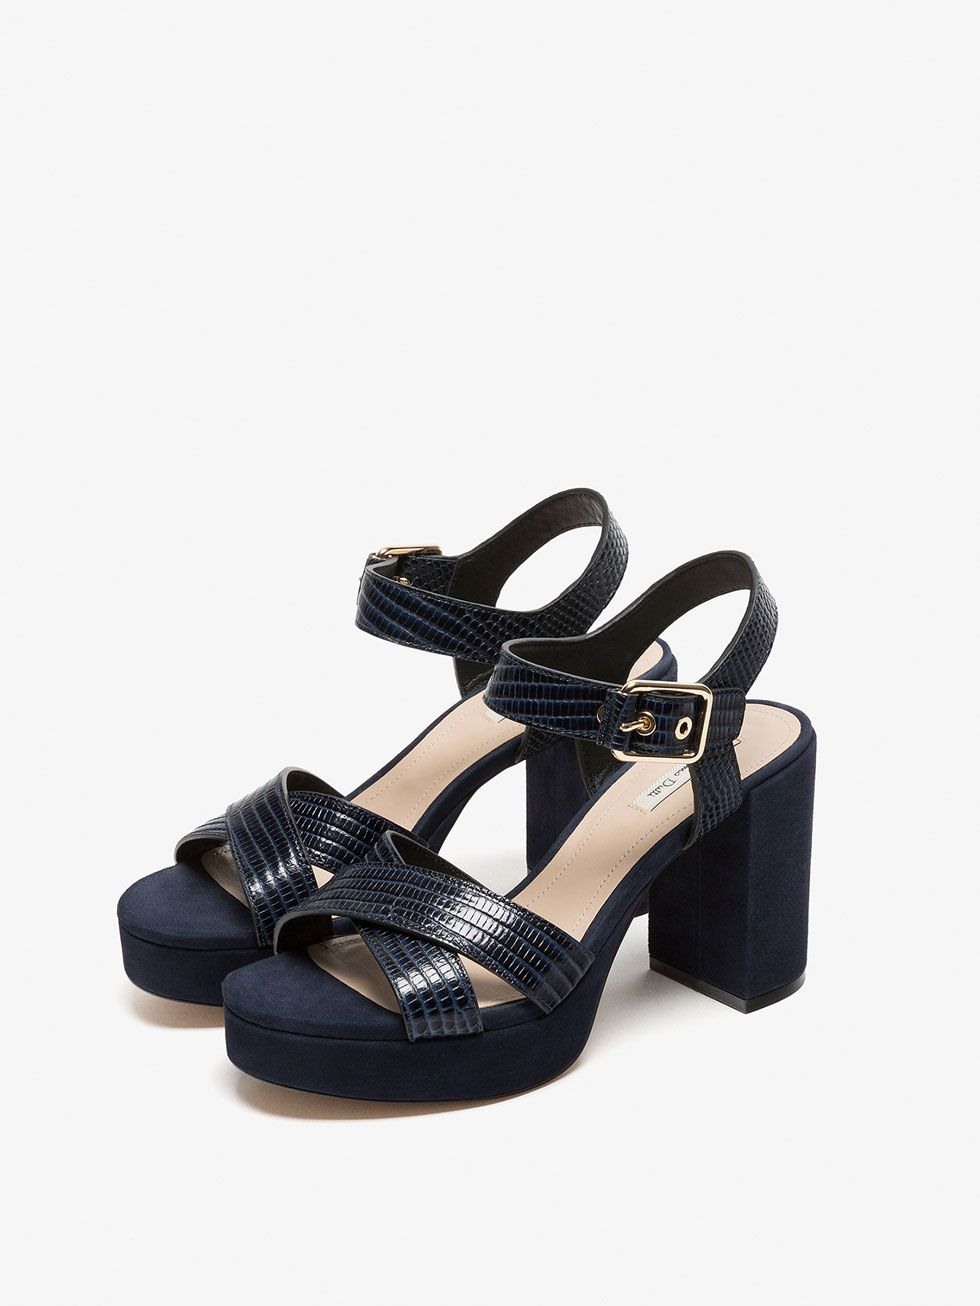 Plataforma Piel Zapatos Tacón Sandalias Sandalia De Mujer Azul 2DEHIeWY9